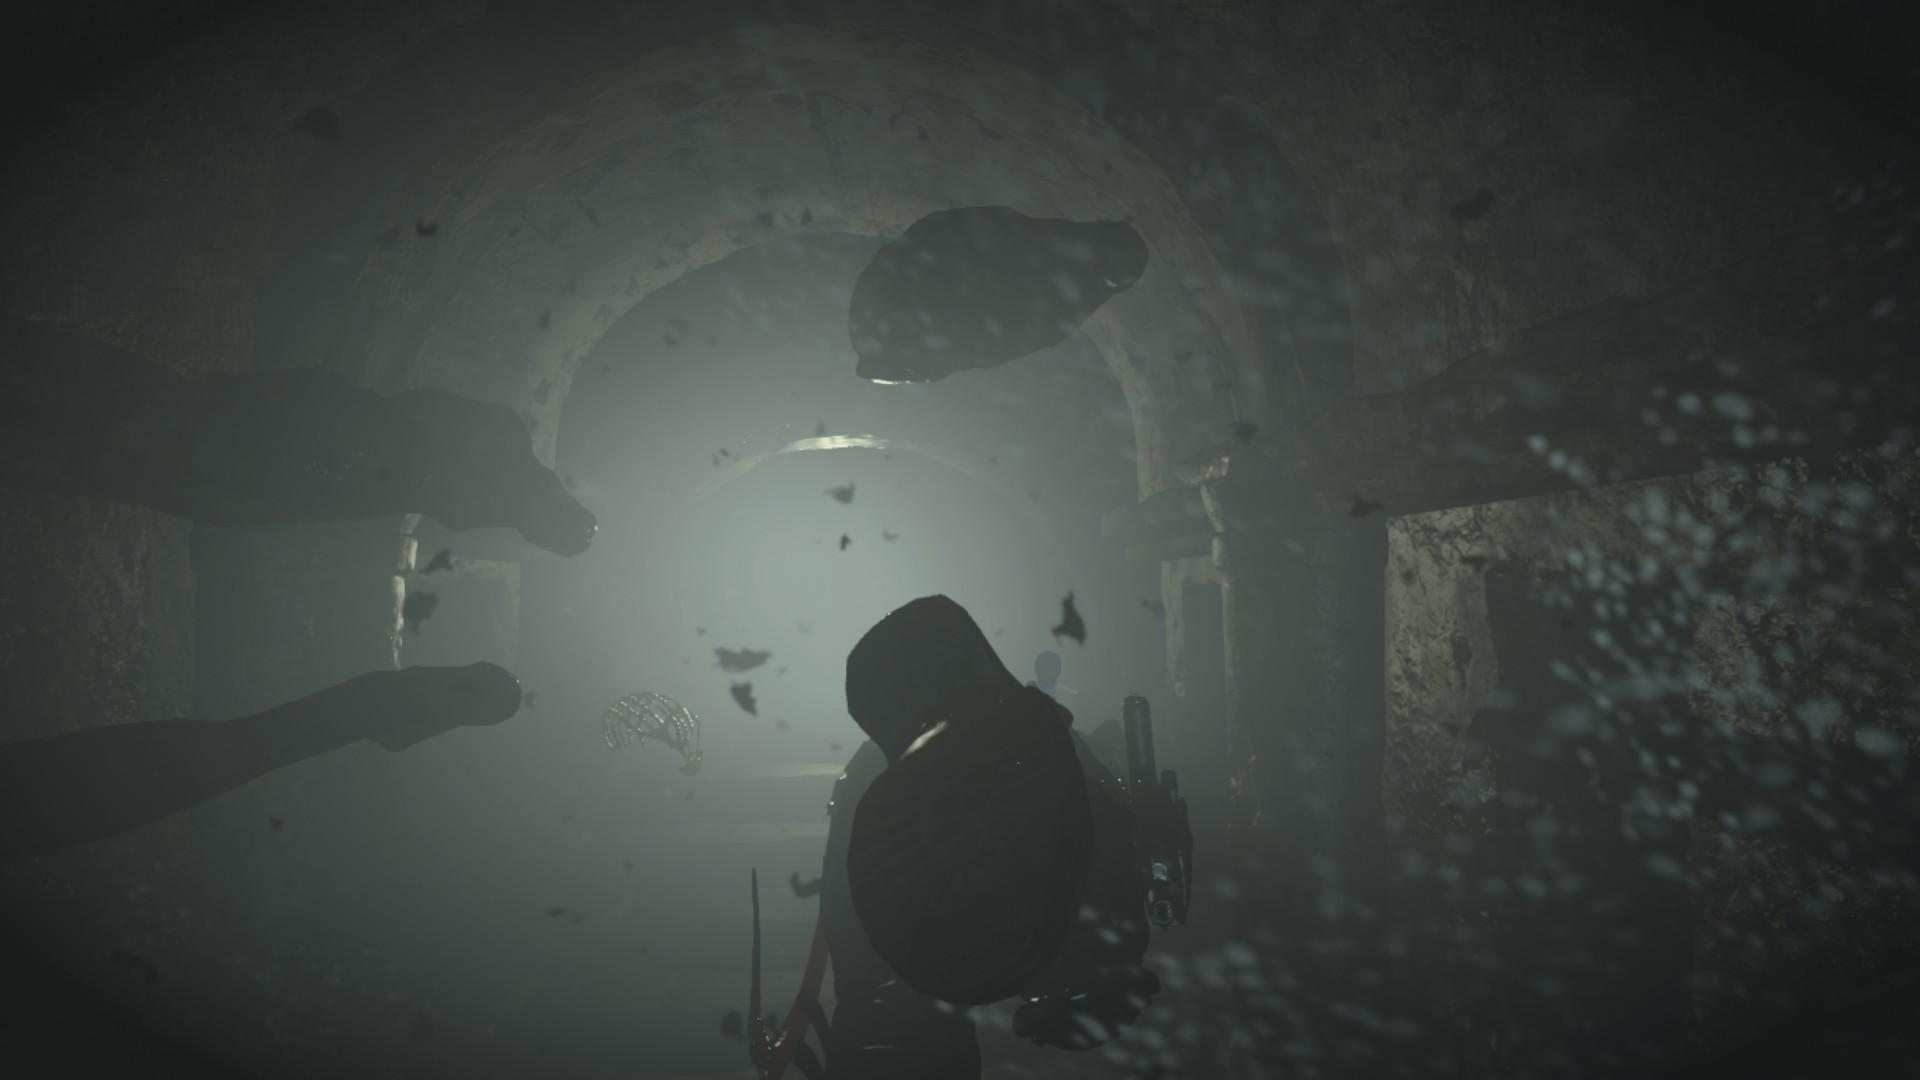 20160706143910_1.jpg - Rise of the Tomb Raider